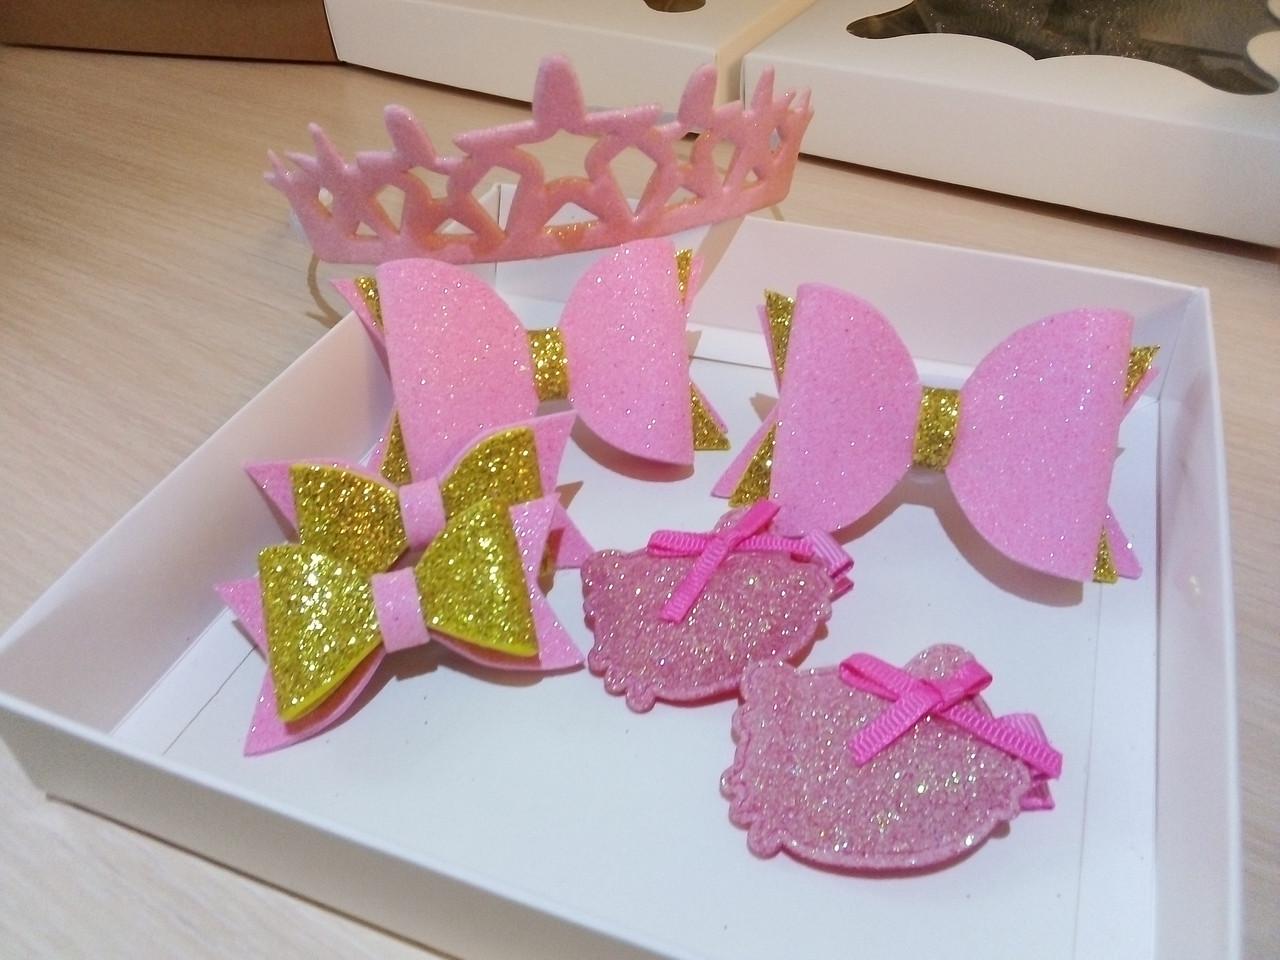 29ce1830468b Набор детских аксессуаров для волос девочки Hello Kitty розовый  (заколки+резинки)